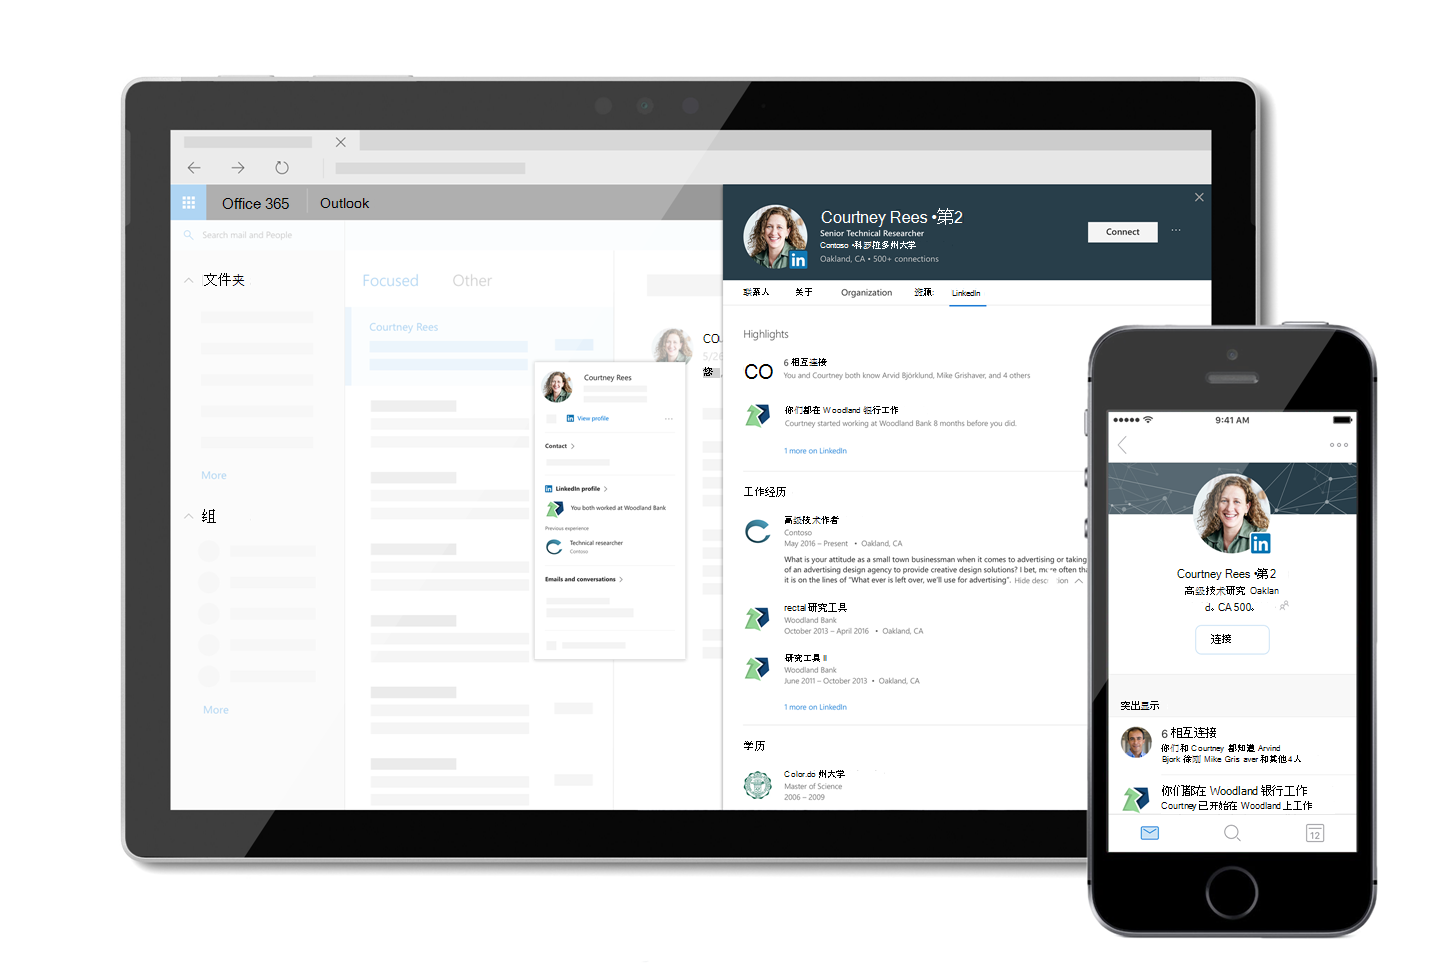 Microsoft 应用中的 LinkedIn